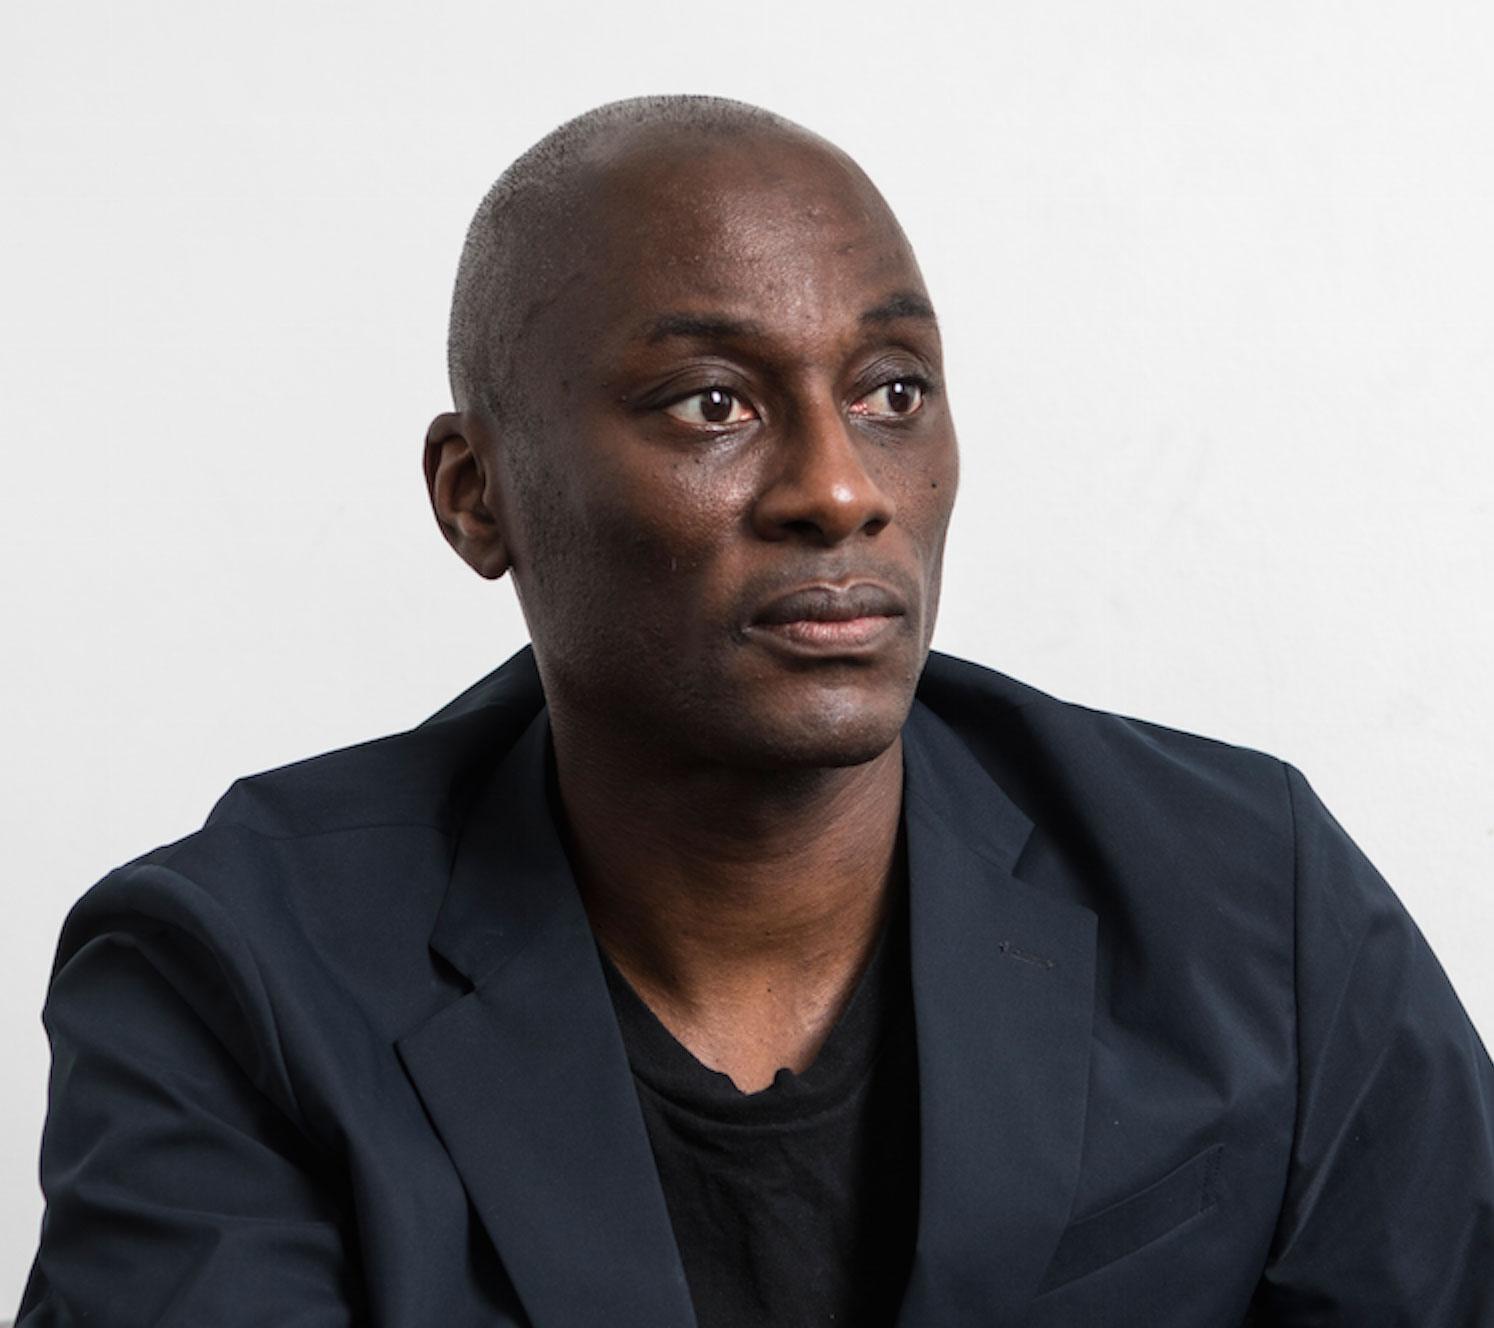 Portrait of Ekow Eshun